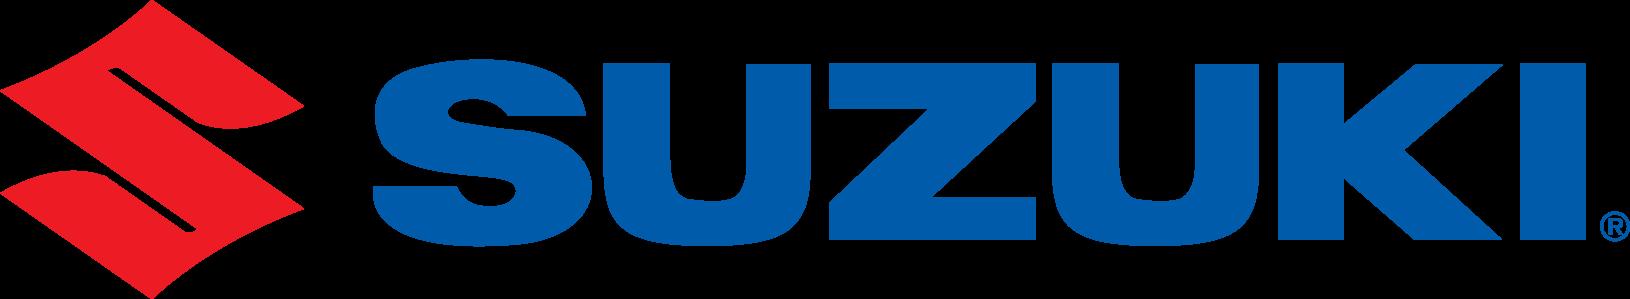 https://omxa.net/wp-content/uploads/2014/02/Suzuki_logo.png